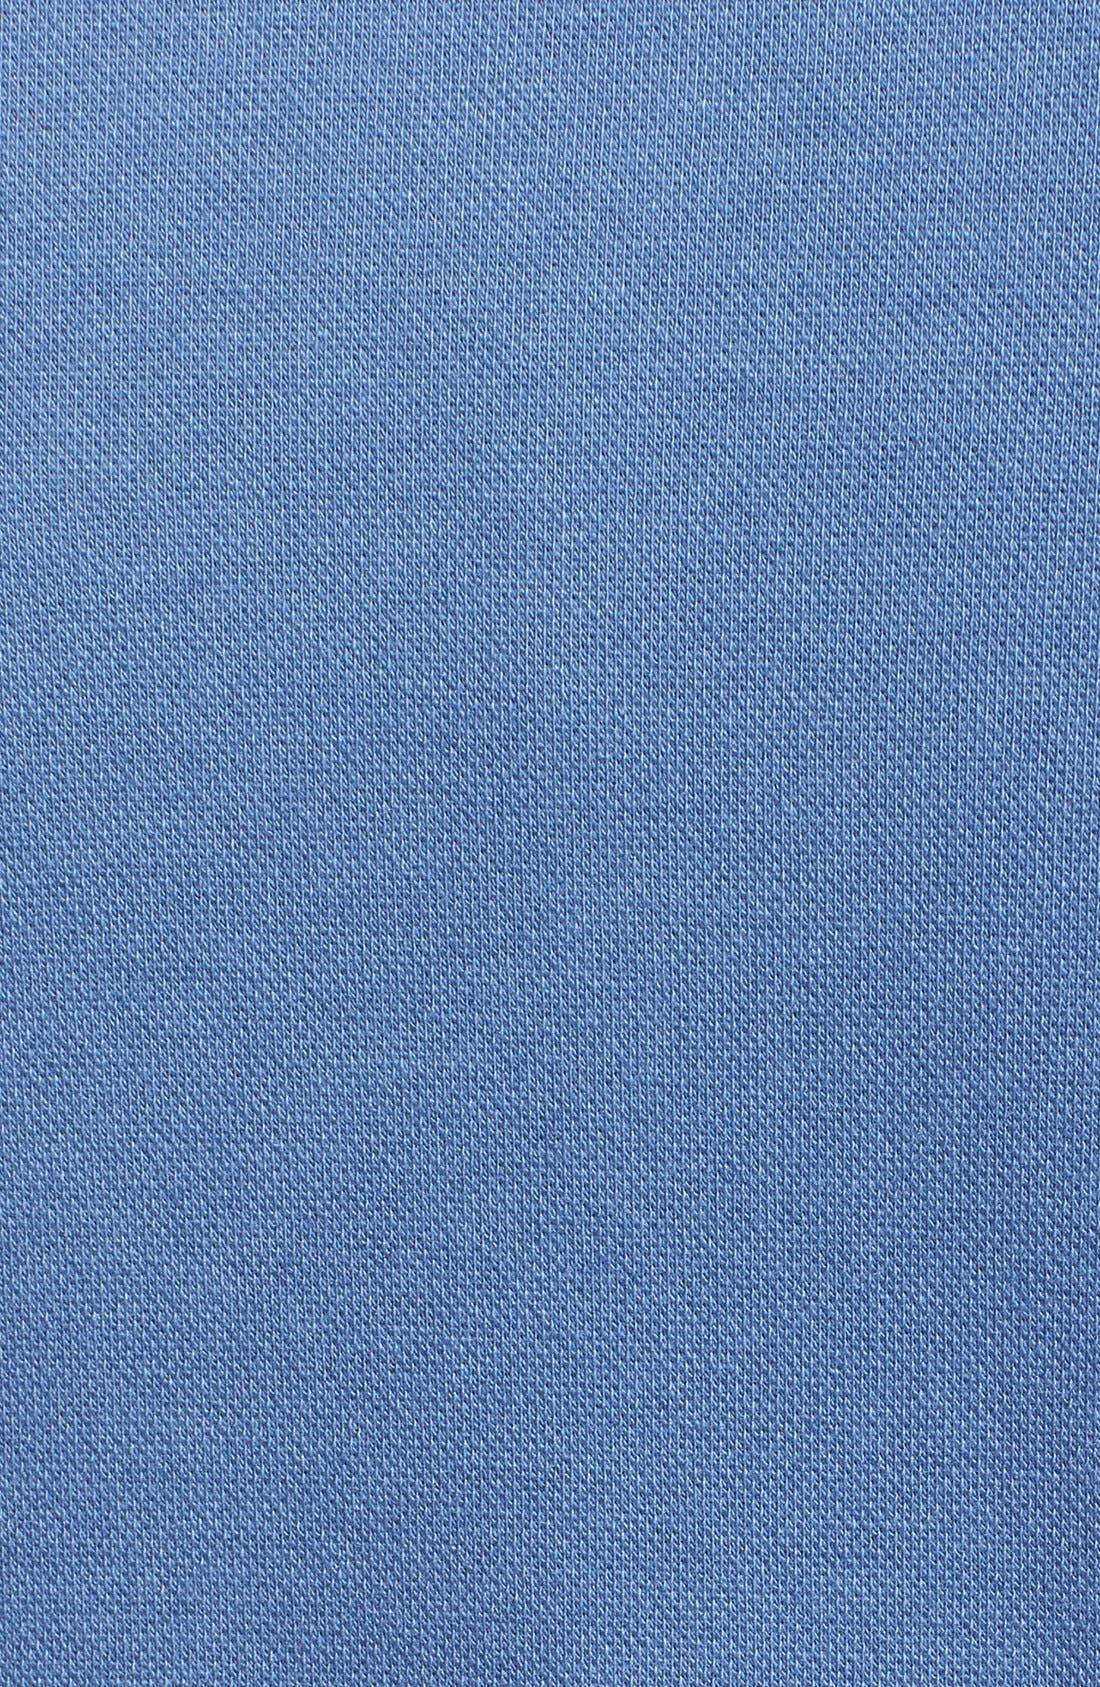 Alternate Image 3  - Tory Burch 'Lidia' Short Sleeve Polo